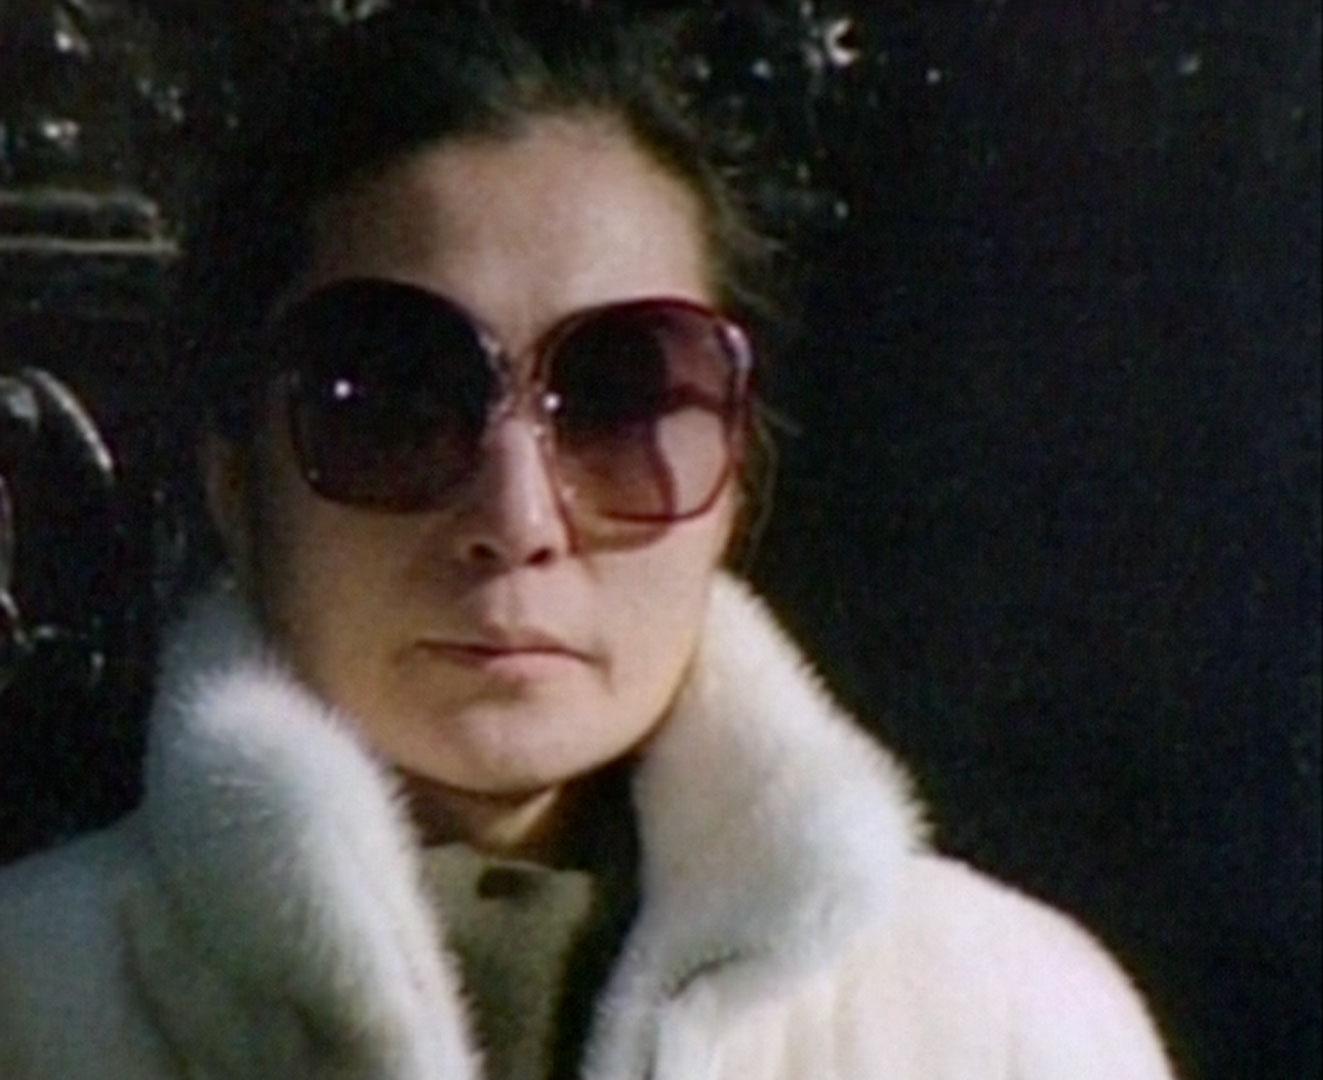 John Lennon, Woman, 1981, directed by Yoko Ono